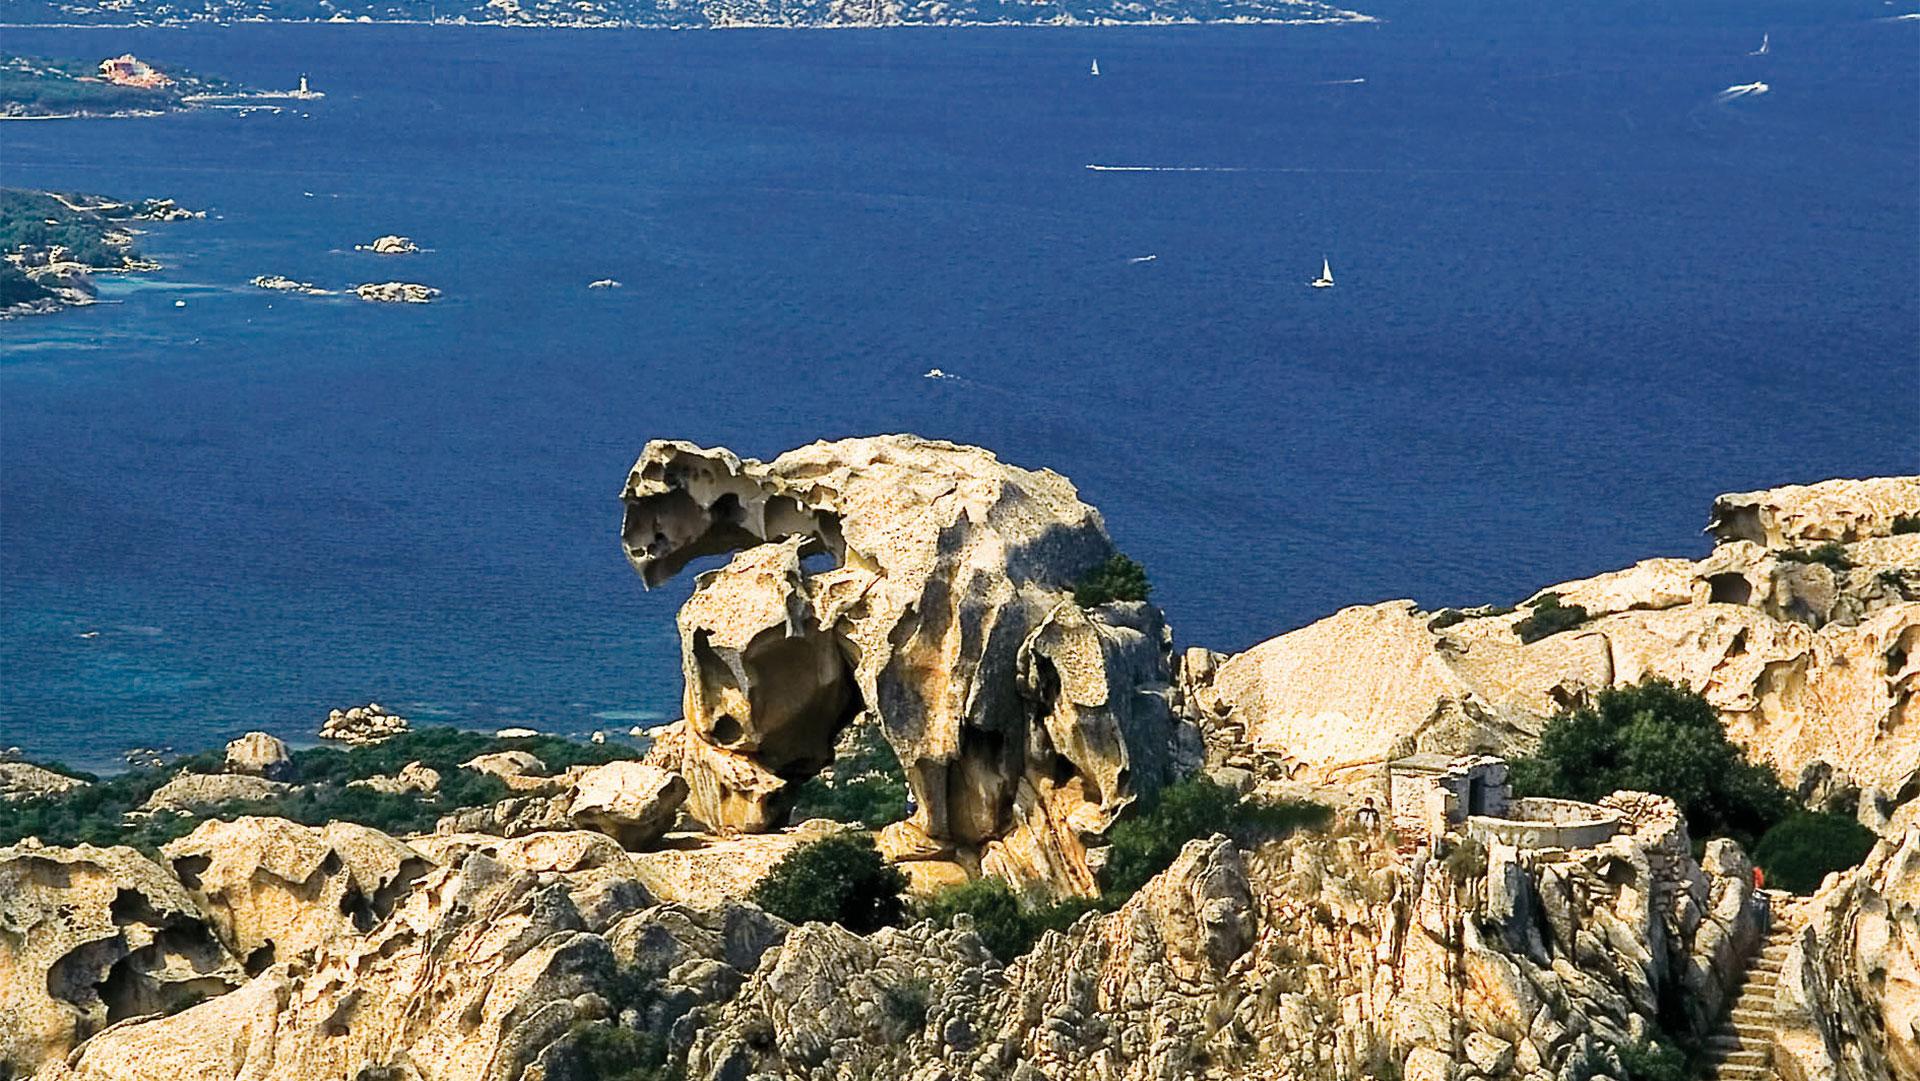 delphina-hotels-slider-destinazioni-palau-orso-costa-smeralda-portocervo-sardegna